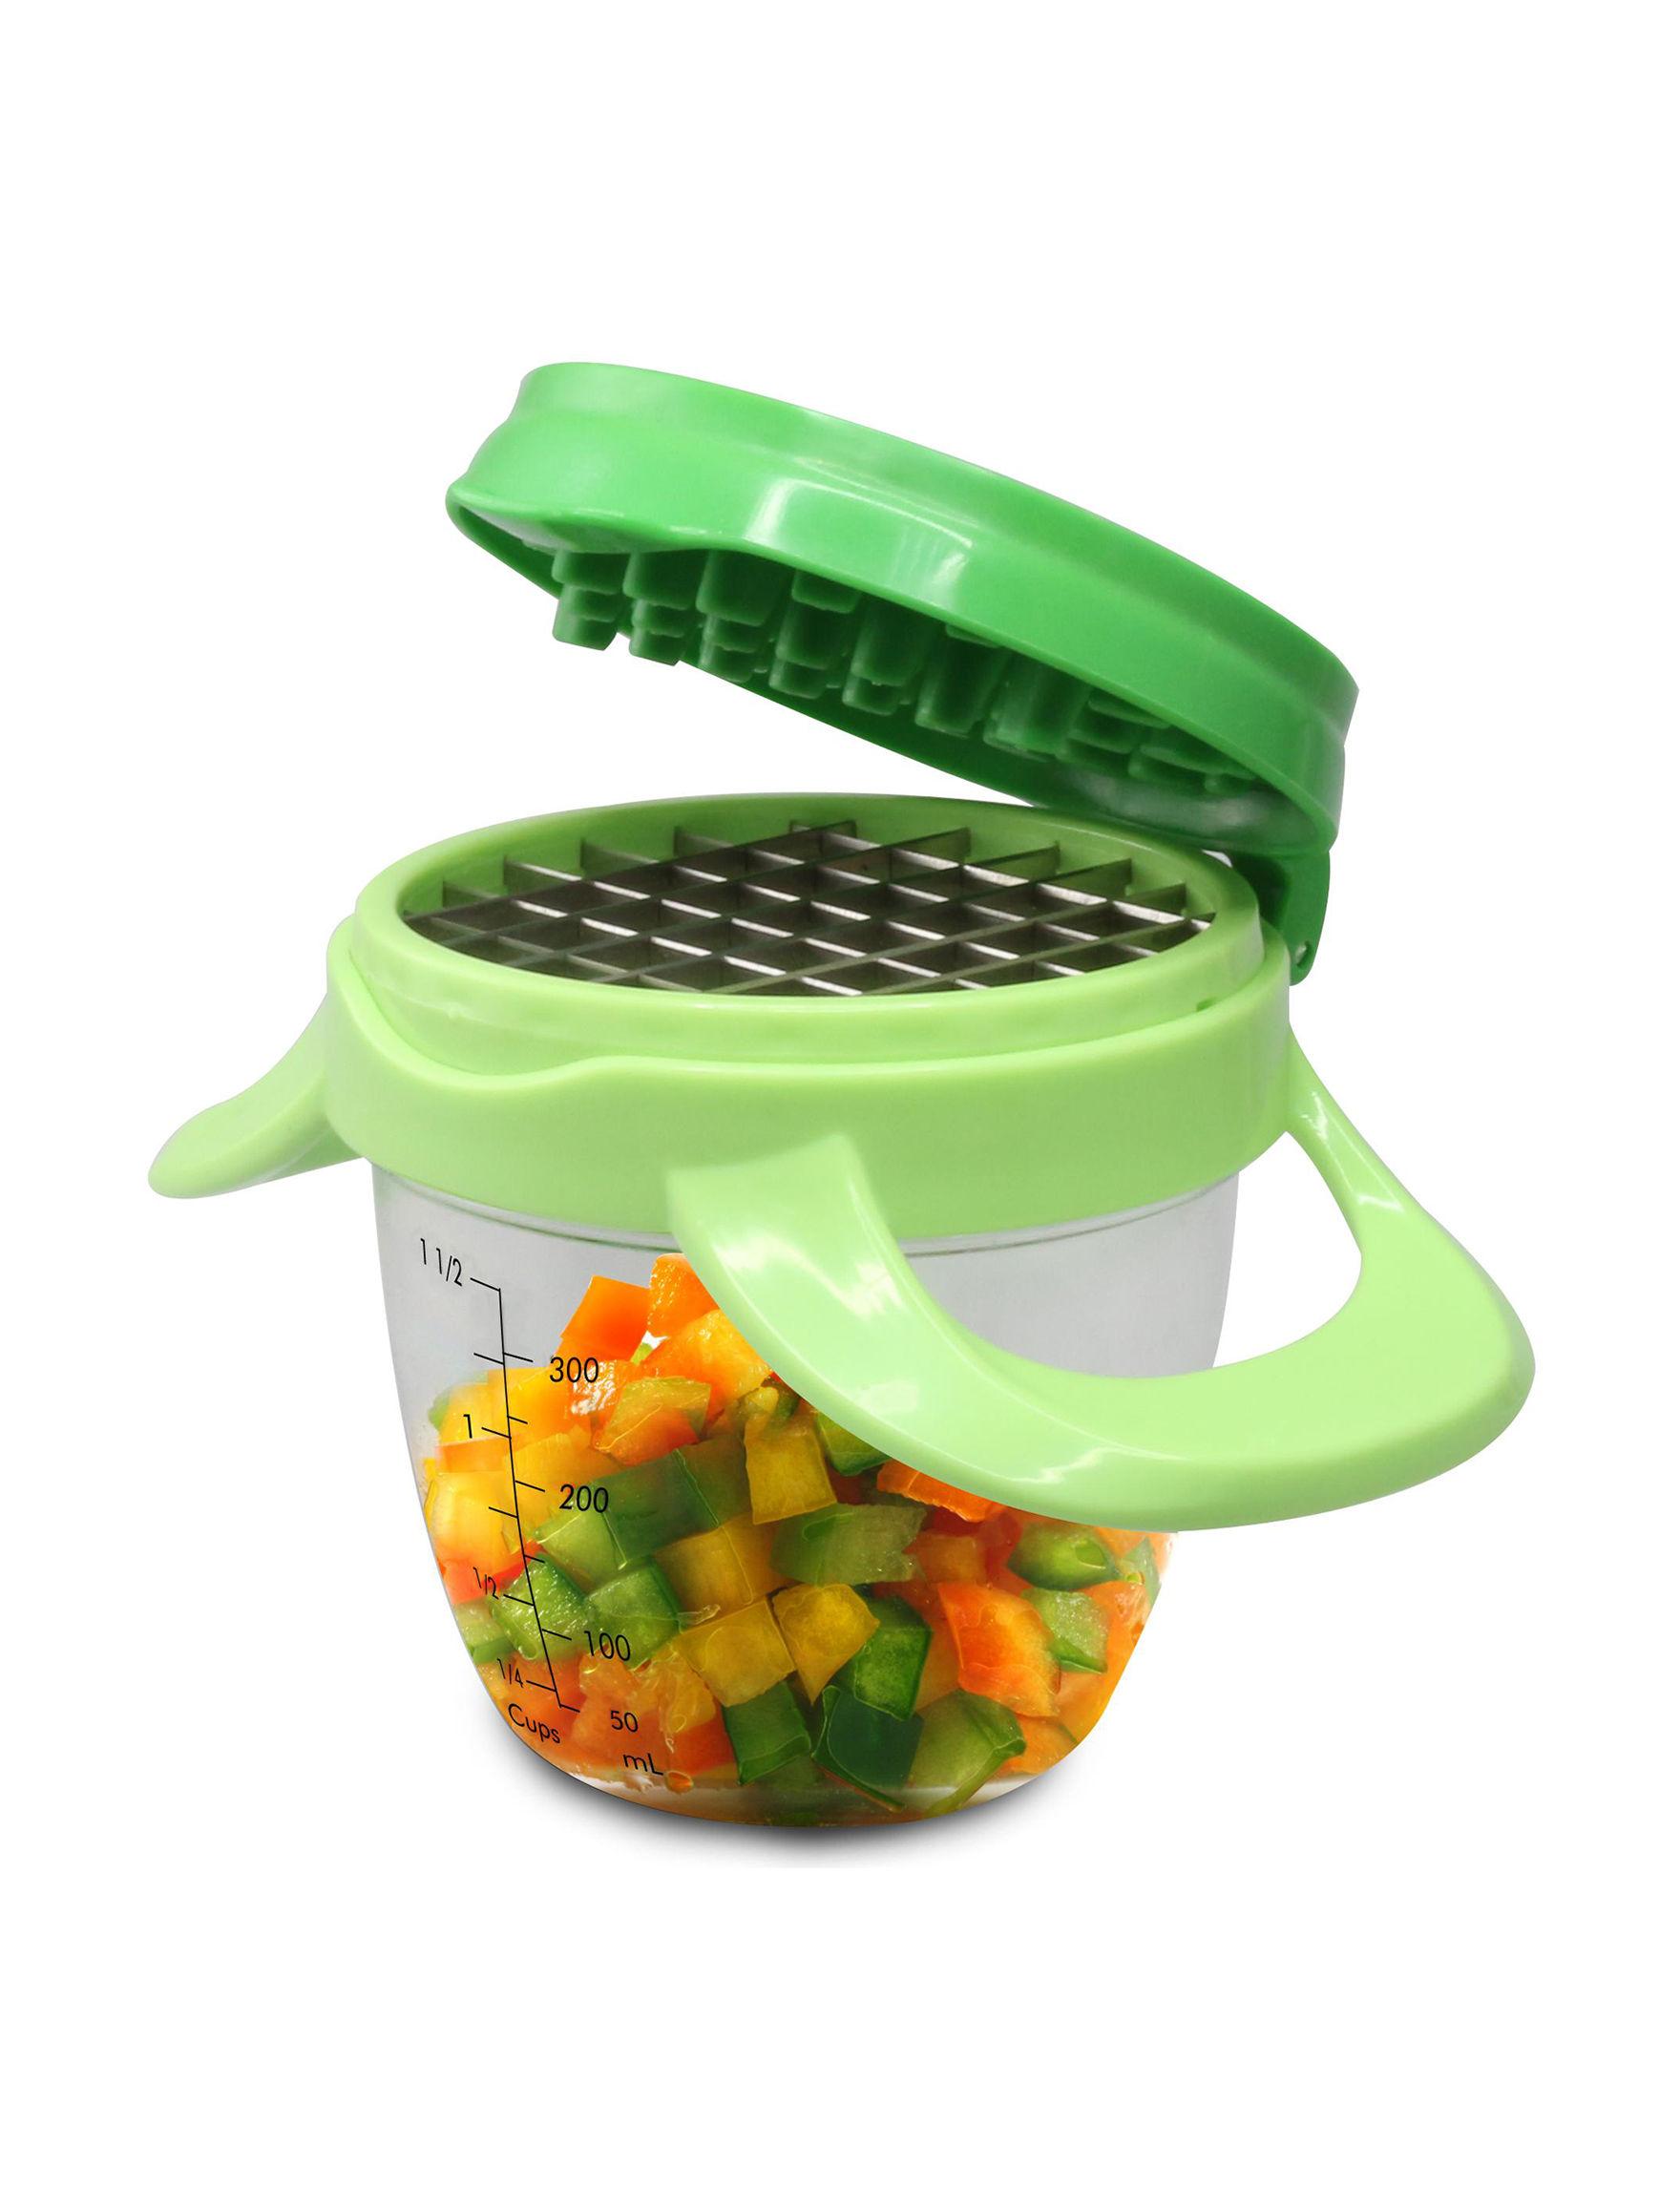 Grand Innovation Green Kitchen Utensils Prep & Tools